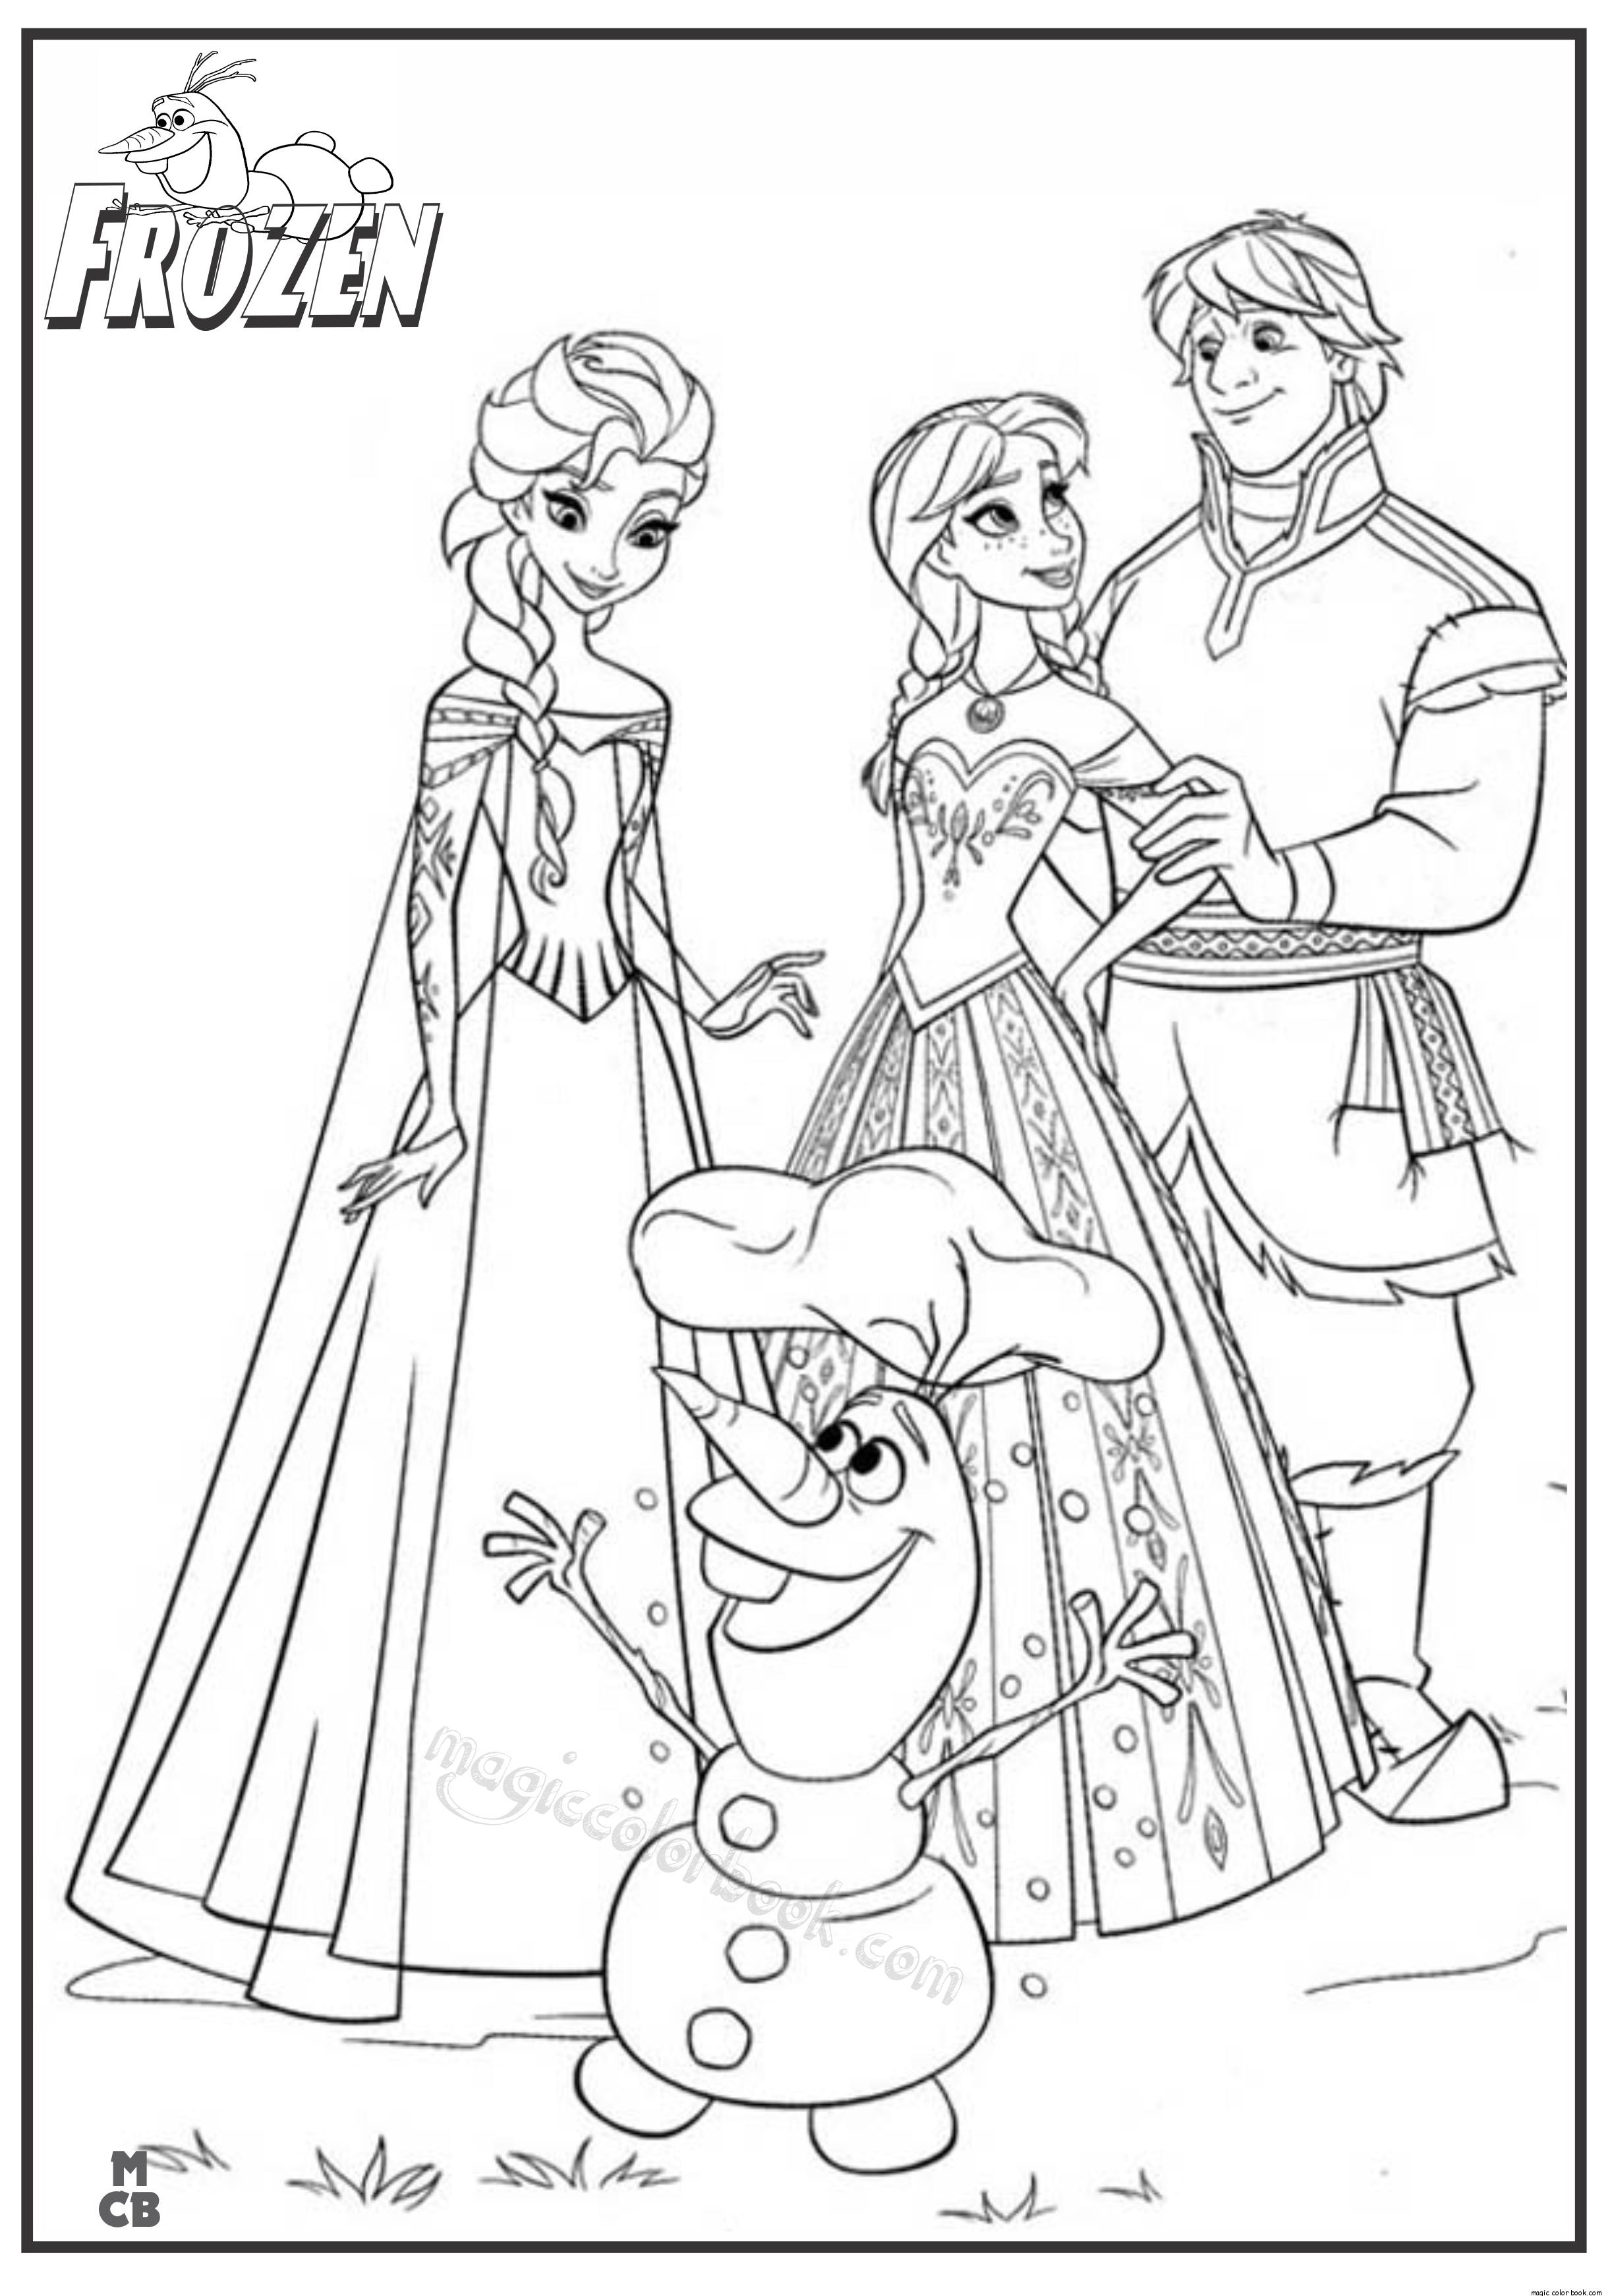 Frozen Disney Princess Coloring Pages Clip Art Library